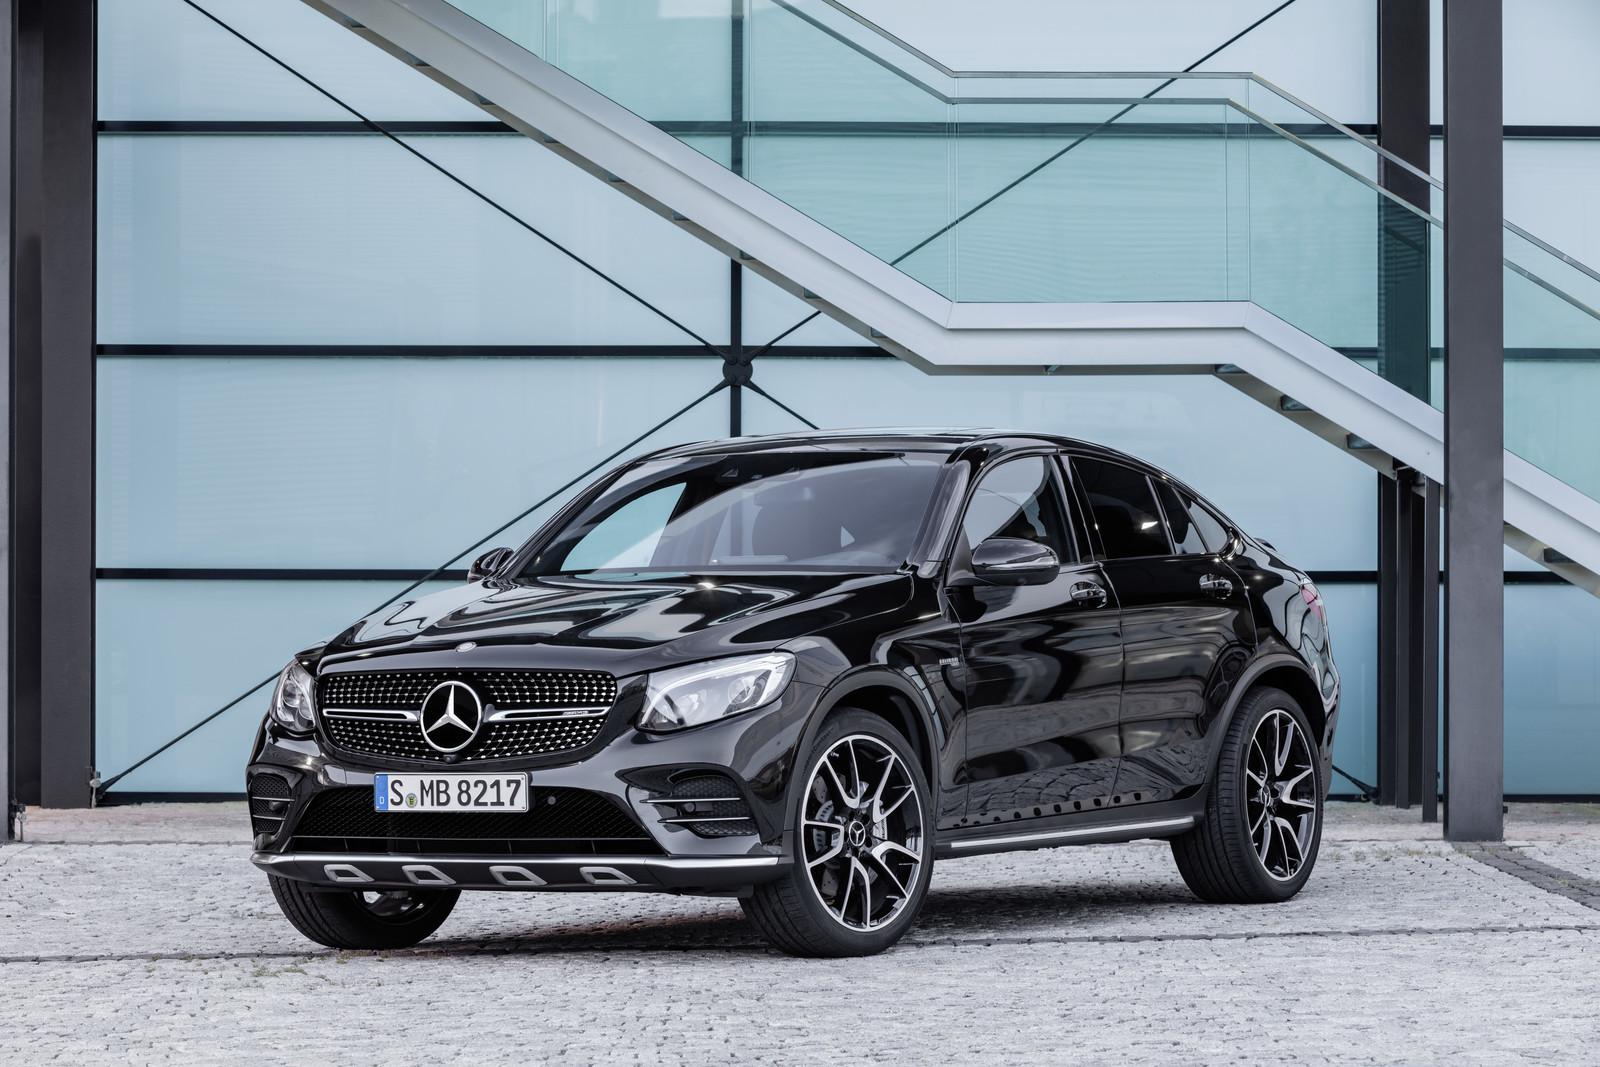 Foto de Mercedes-AMG GLC 43 4MATIC Coupé (10/24)